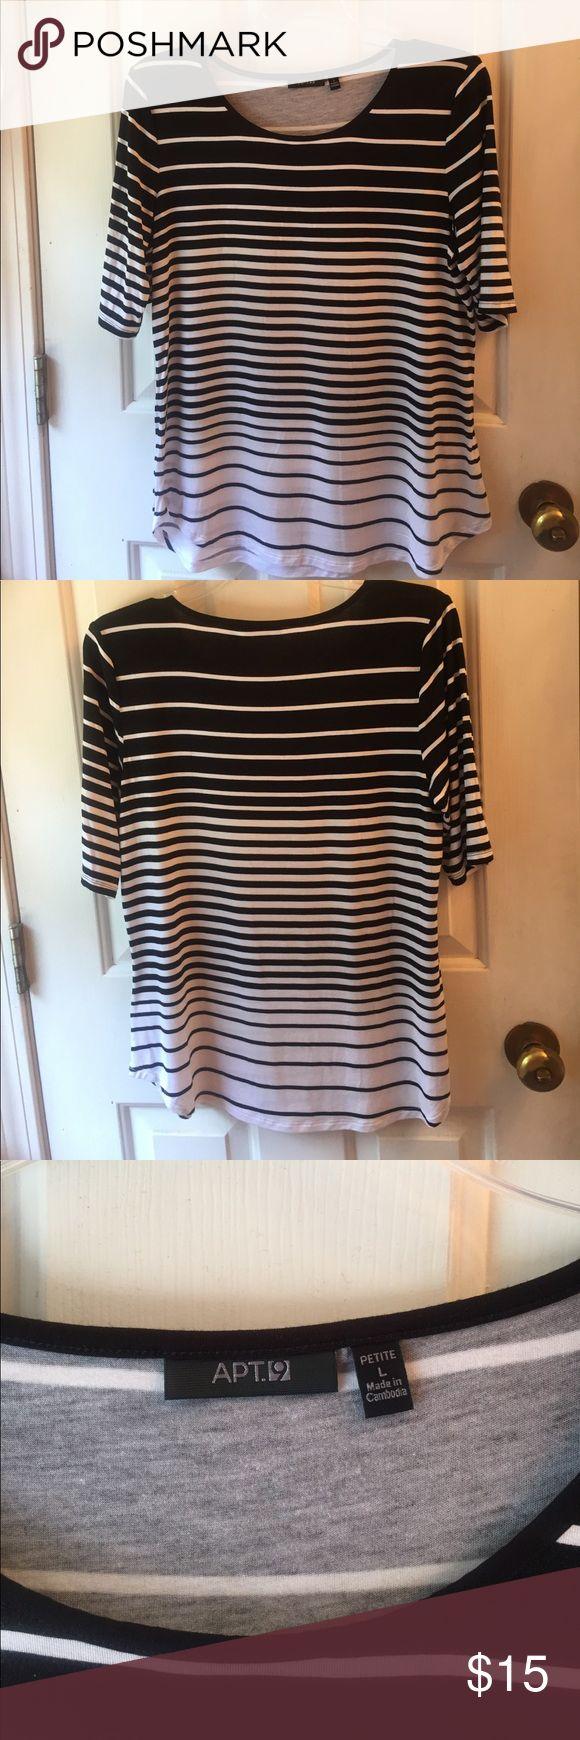 Apt. 9 size LP black/white stripe shirt Apt. 9 size LP shirt, fun black/white stripe detailing NWOT smoke free home Apt. 9 Tops Tees - Short Sleeve